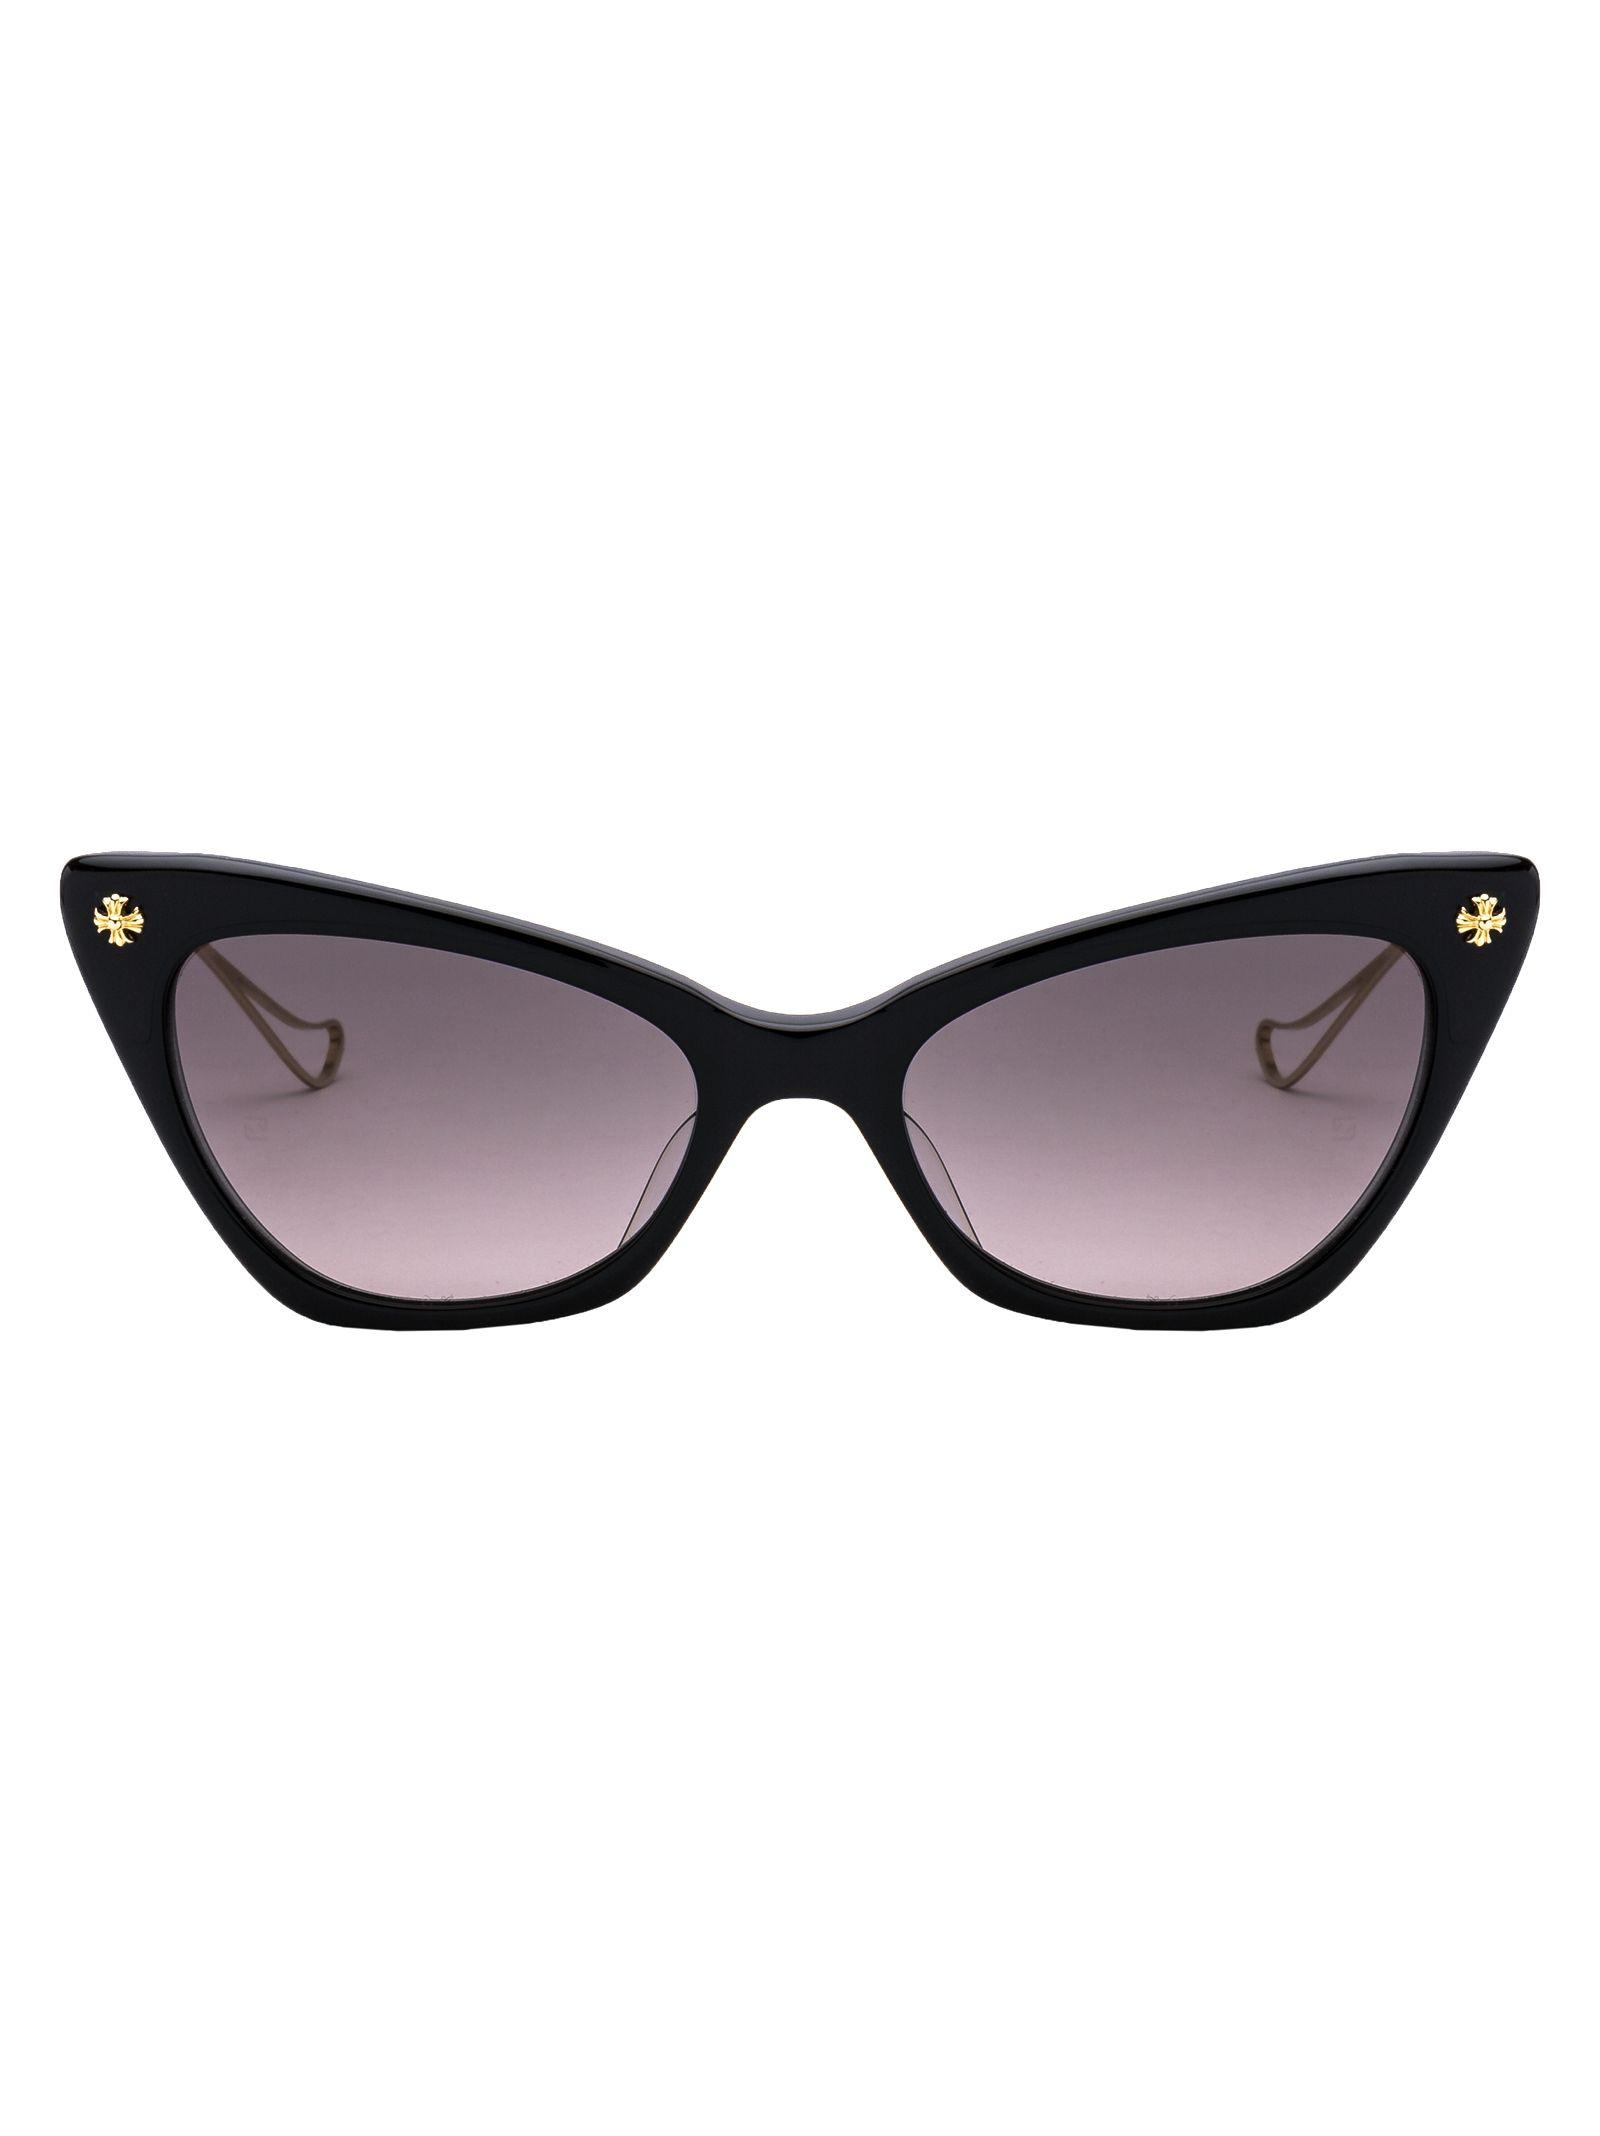 CHROME HEARTS Bailey Girl Sunglasses in Bkgp